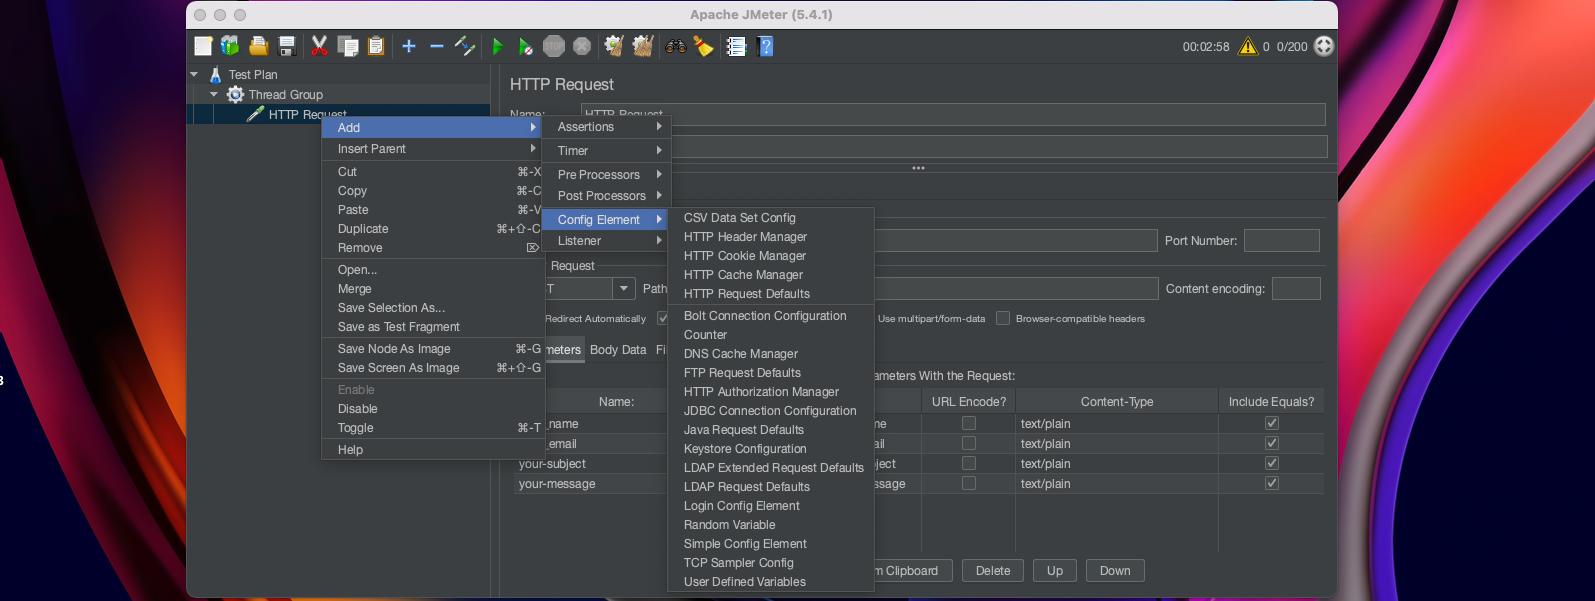 Adding Configuration